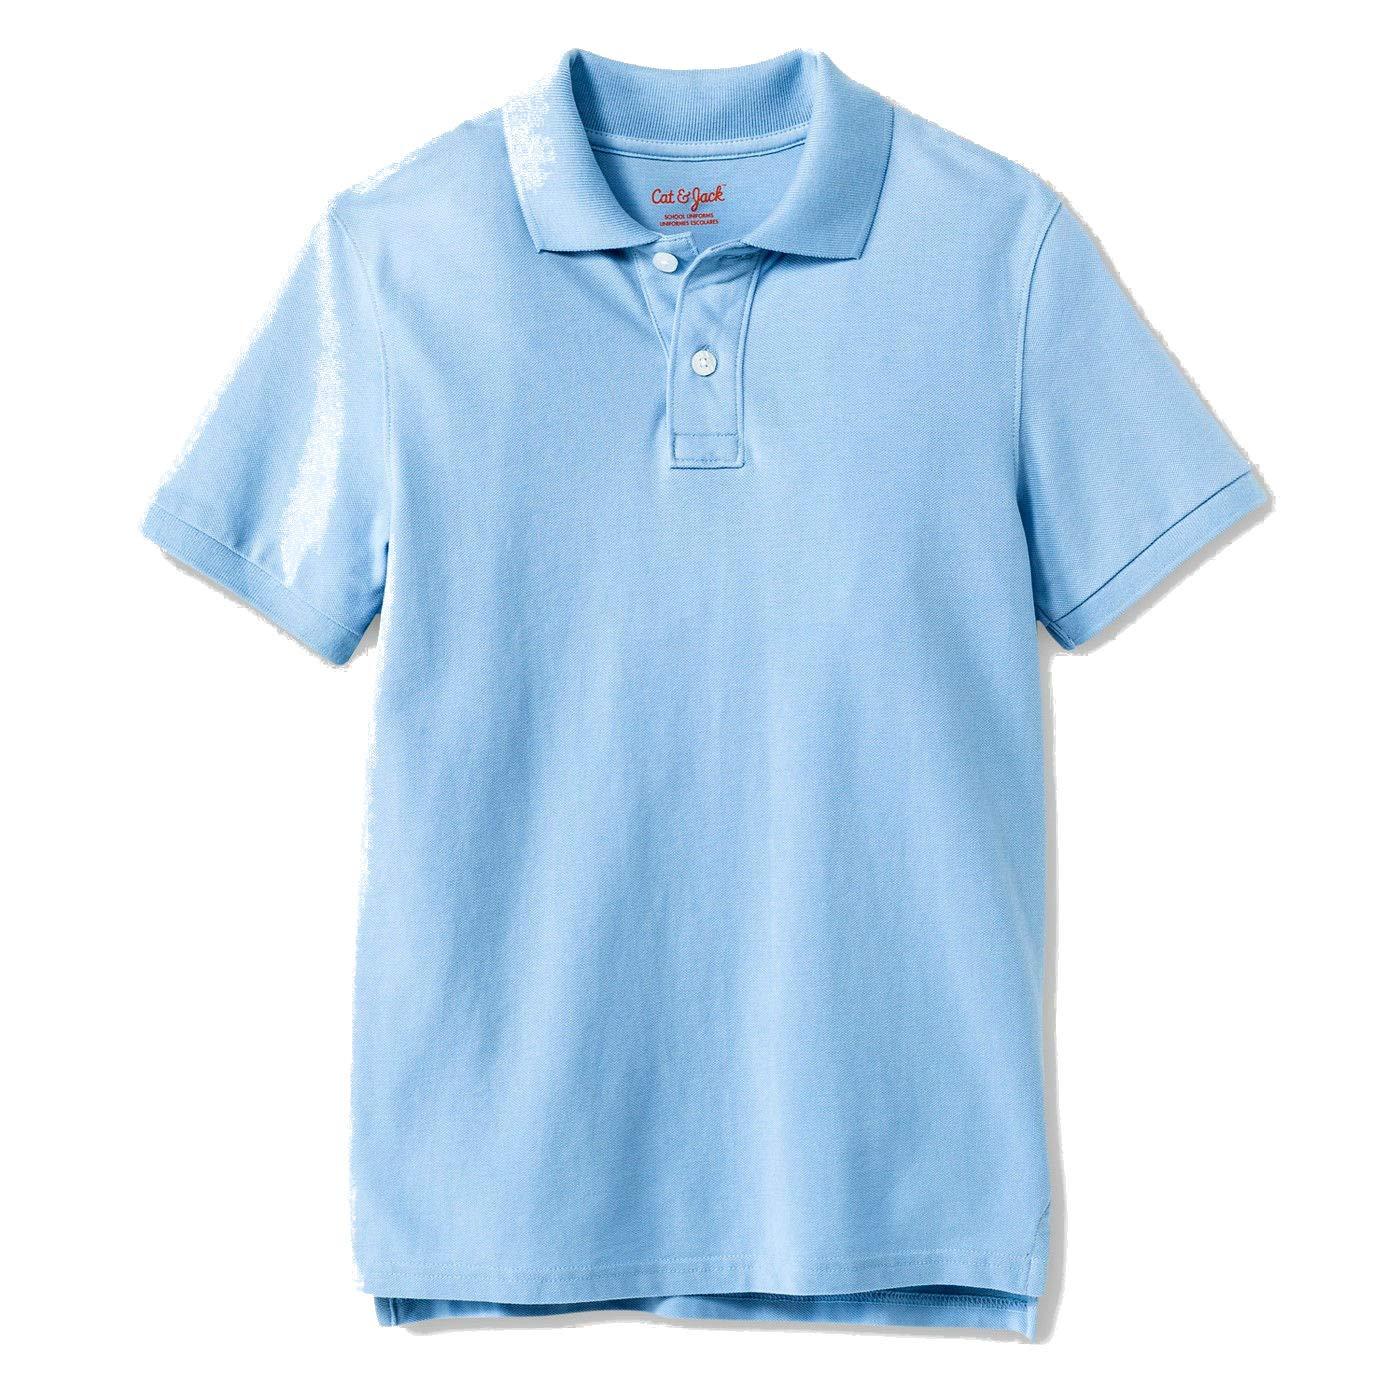 1dcfb7c2d Amazon.com: Cat & Jack Boy's Interlock Uniform Polo Shirt, Light Blue:  Clothing